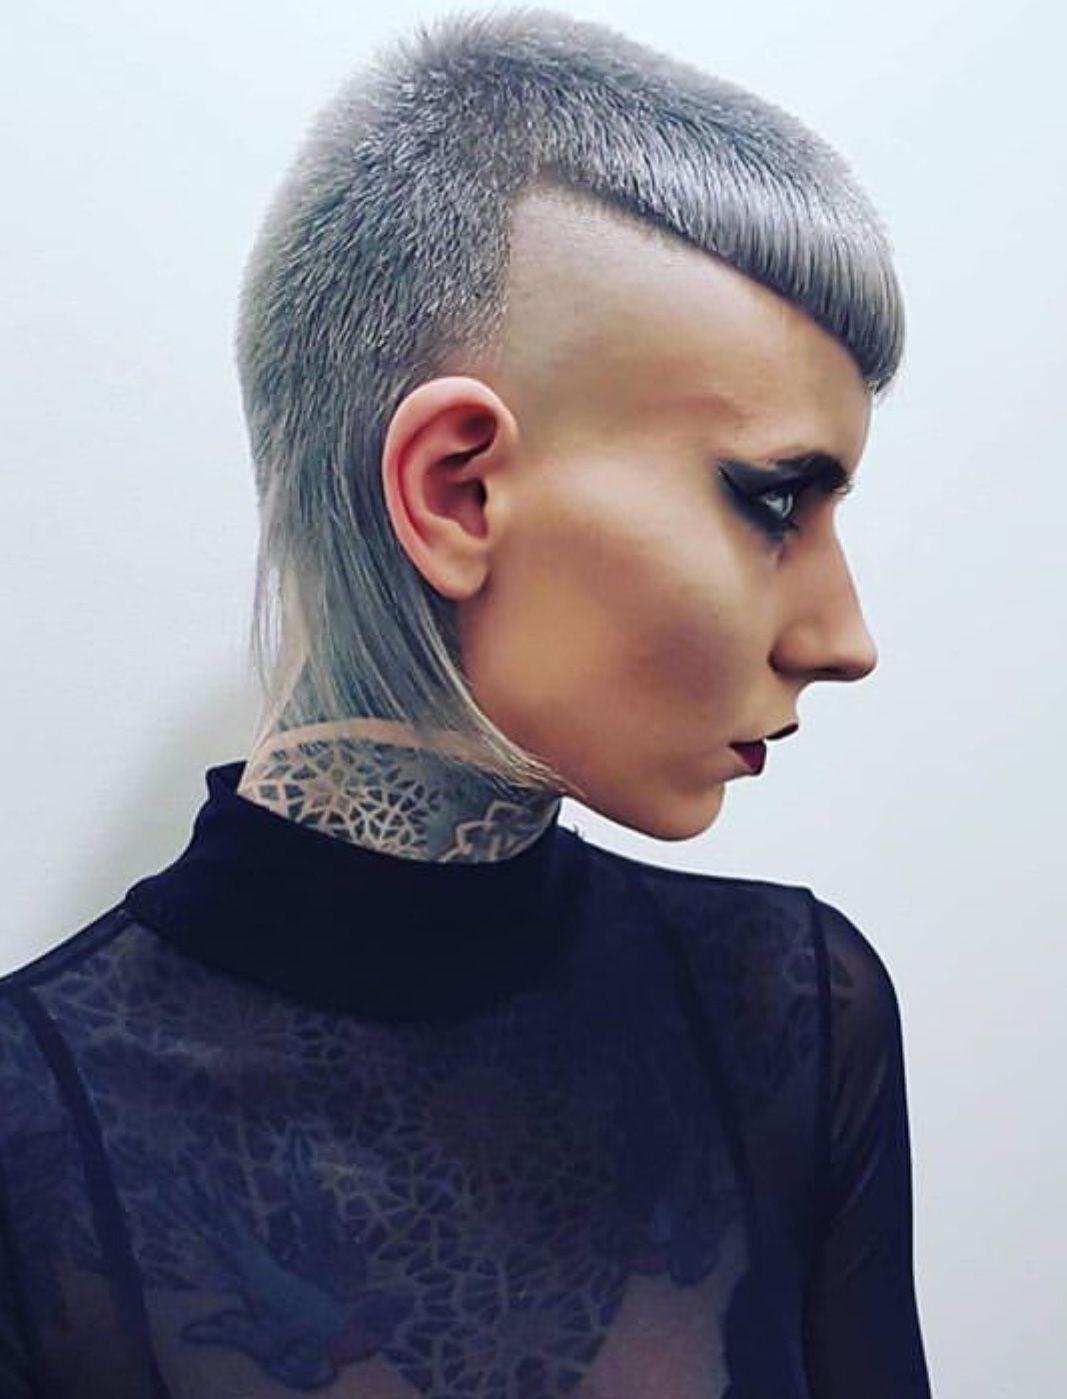 Mullet Girl With Micro Bangs Mullet Hairstyle Short Hair Styles Hair Styles